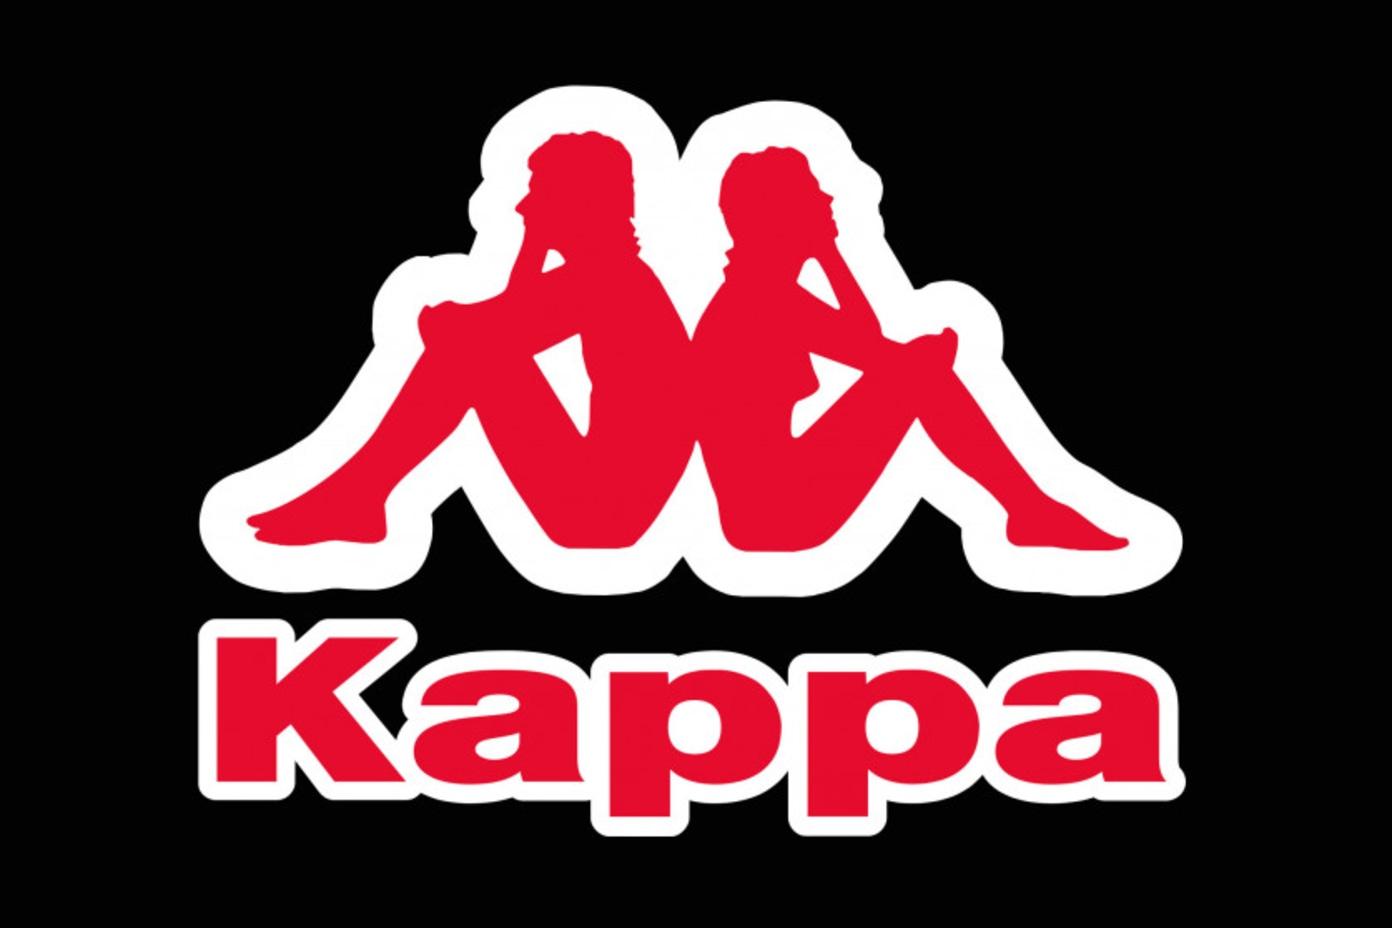 ataque libertad acoso  Kappa Coming Soon to Shelflife | Shelflife